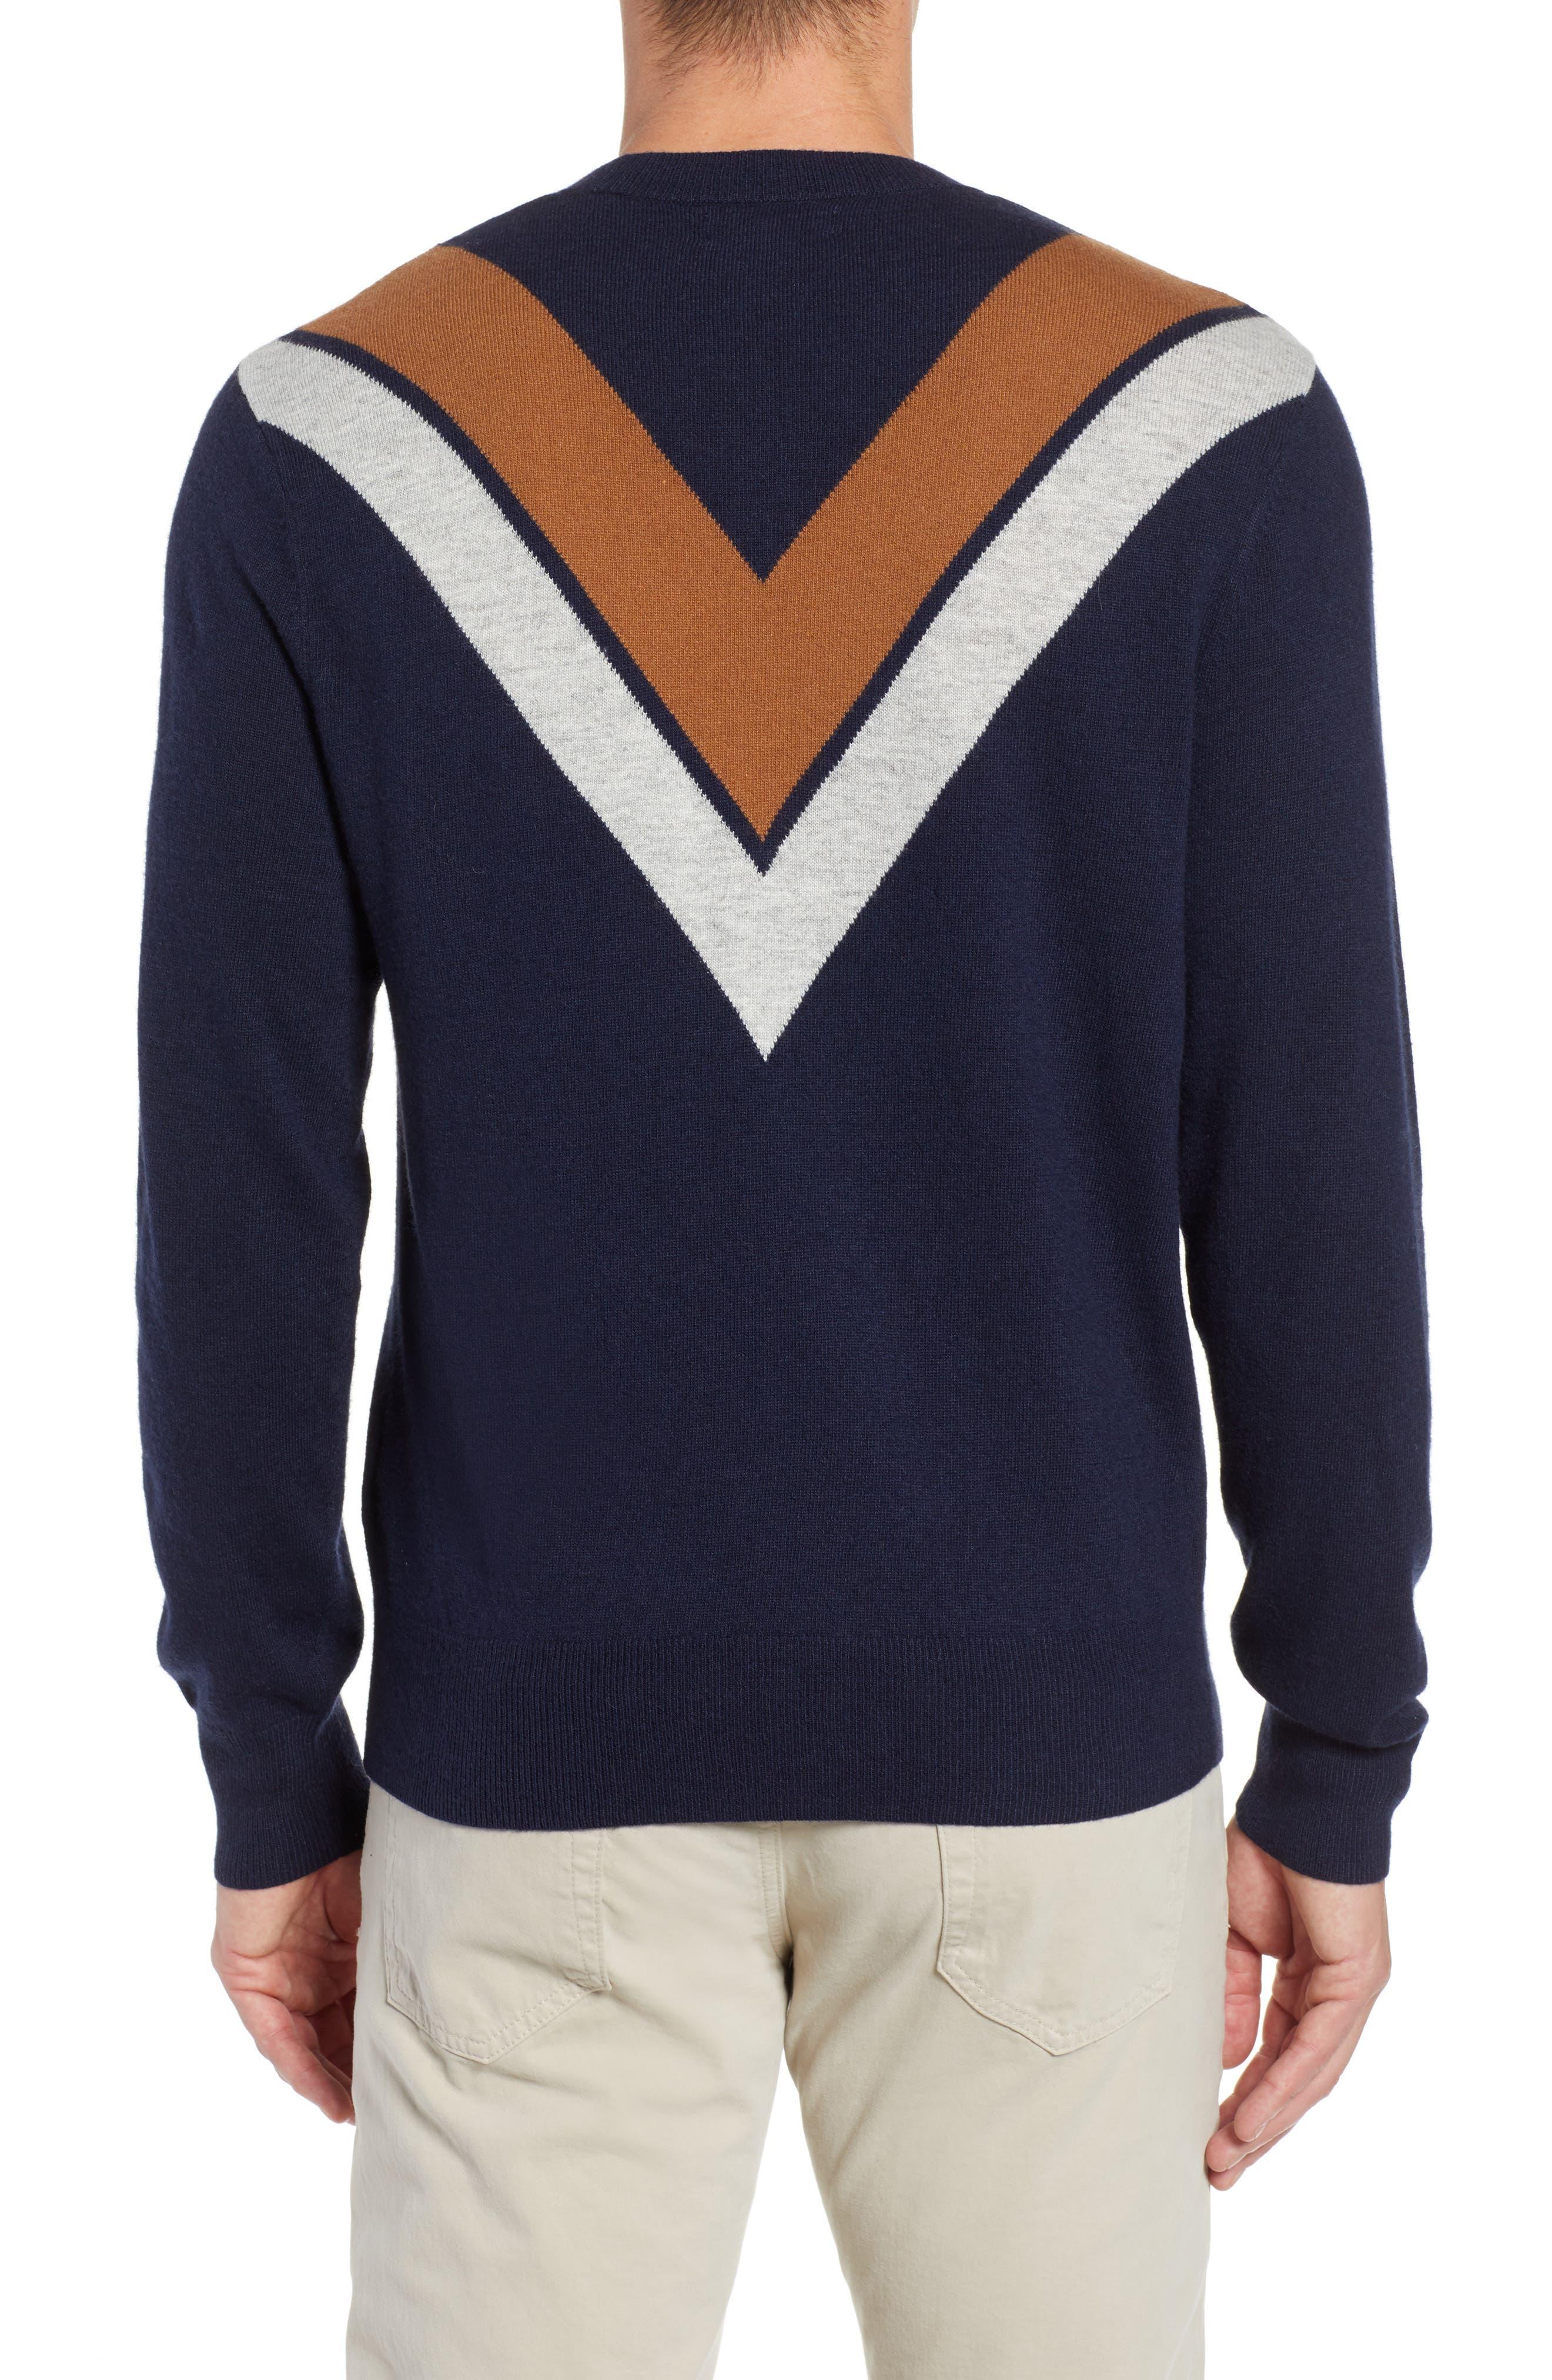 Minton V Crewneck Sweater,                             Alternate thumbnail 2, color,                             DARK NAVY/ LHN/ BURNT SUGAR